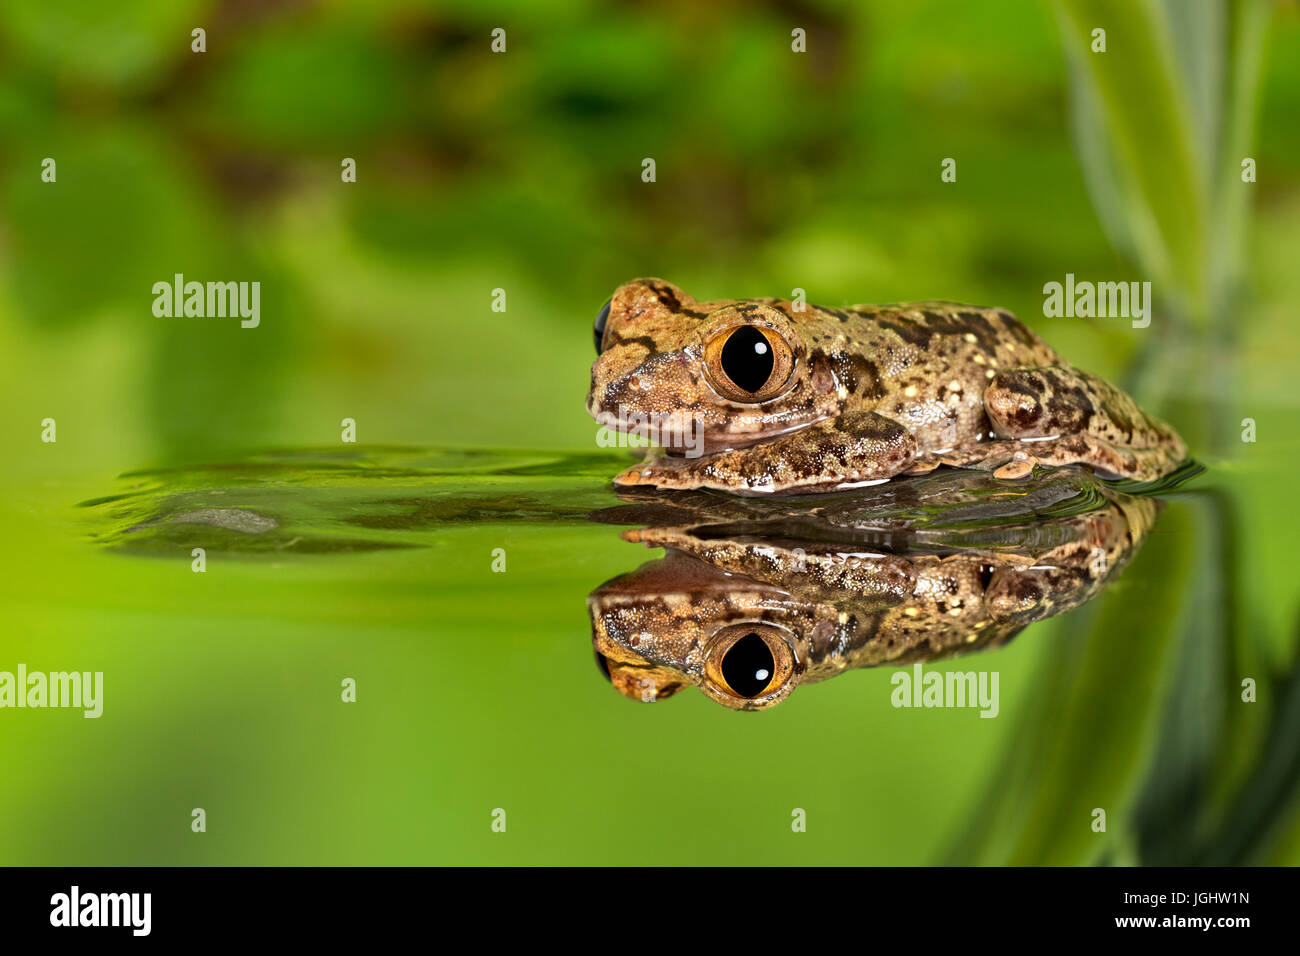 Big Eyed Forest Tree Frog Photo Stock